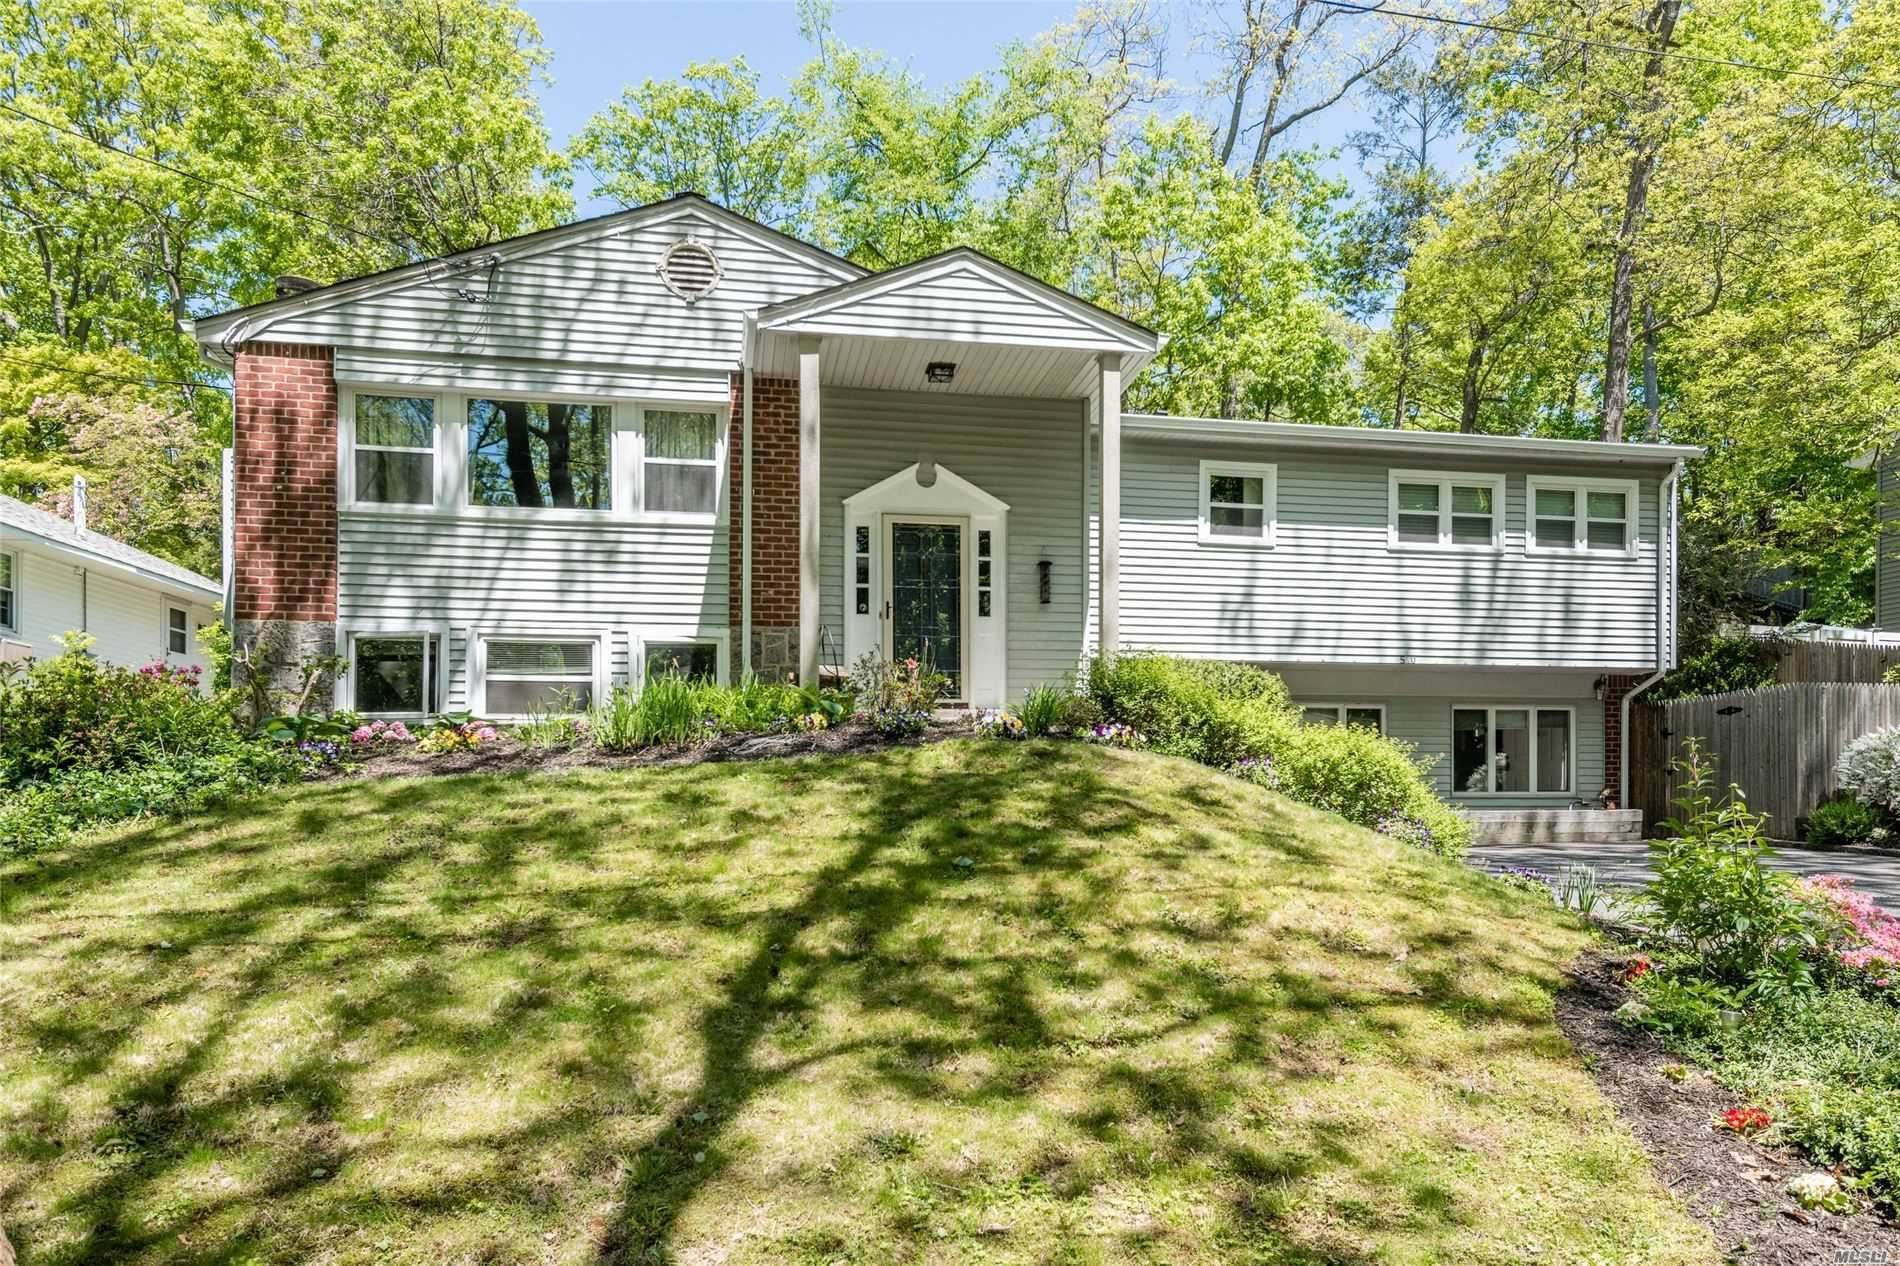 50 Cliftwood Dr, Huntington, NY 11743 - MLS#: 3197873